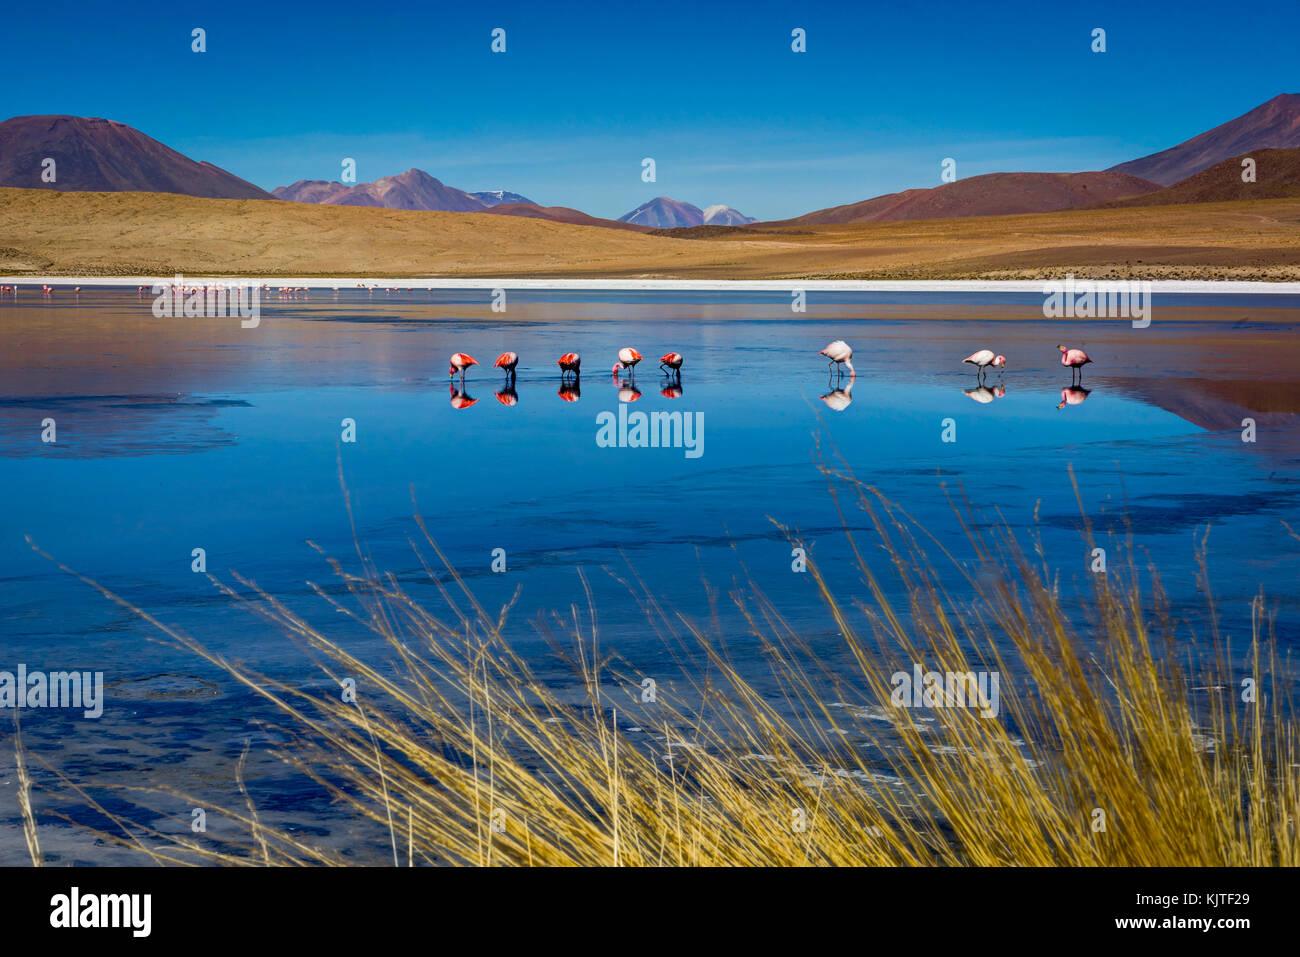 Photo taken in August 2017 in Altiplano Bolivia, South America: Pink Flamingos Laguna Hedionda Altiplano Bolivia - Stock Image